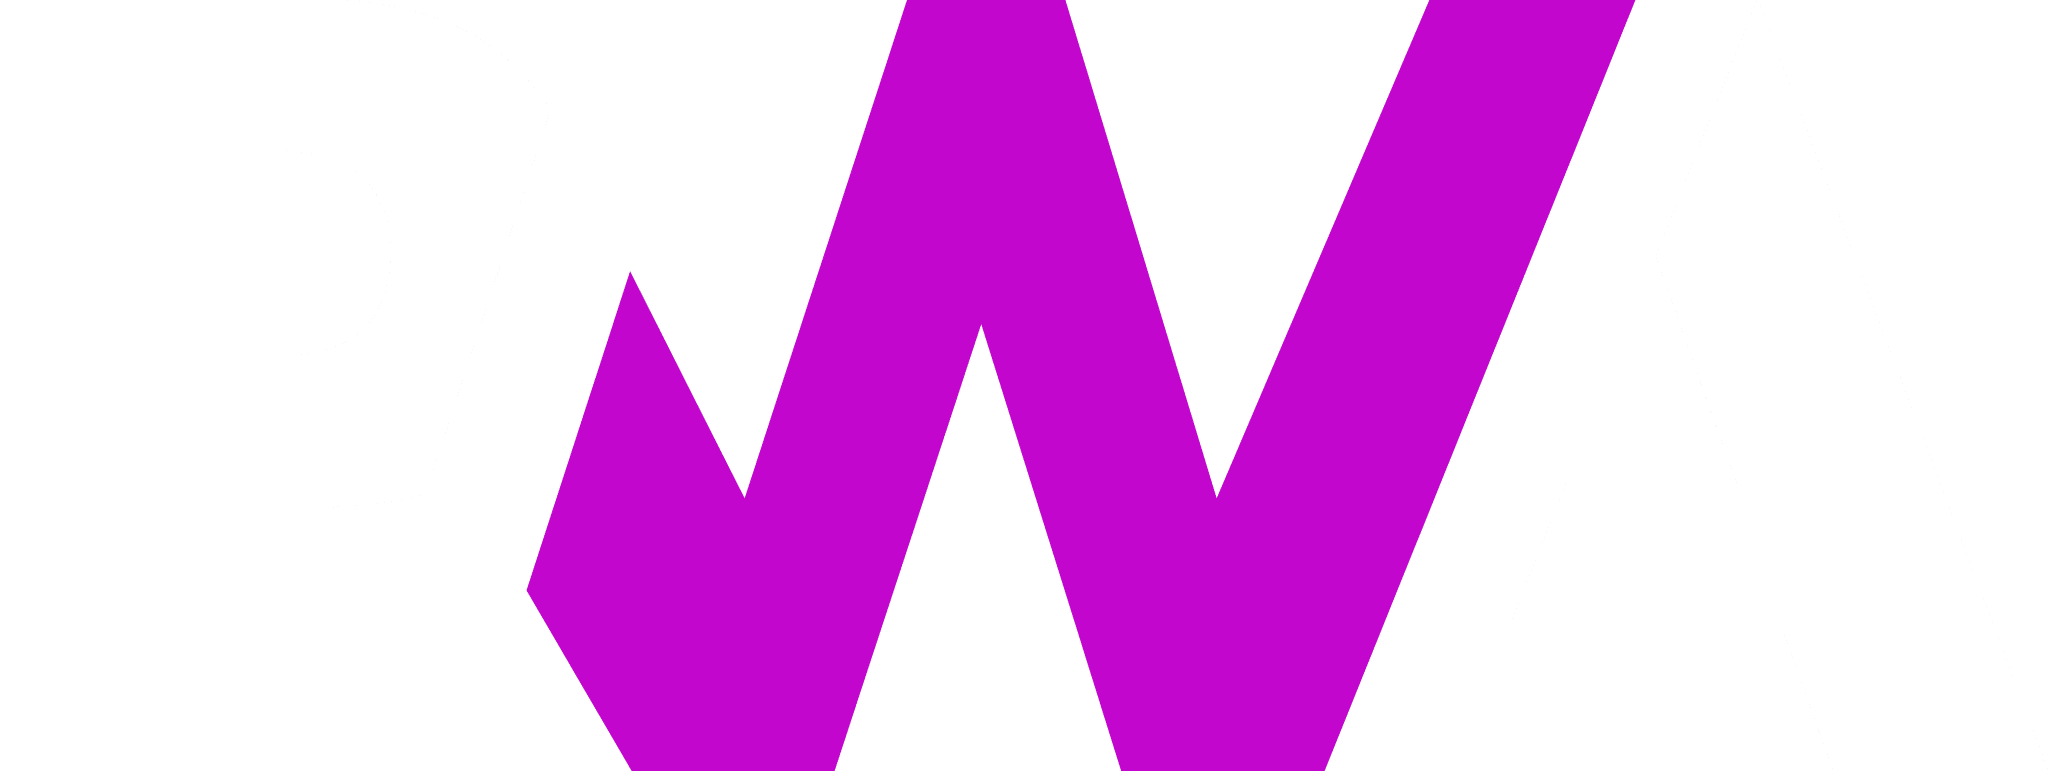 Apps PWA Radio